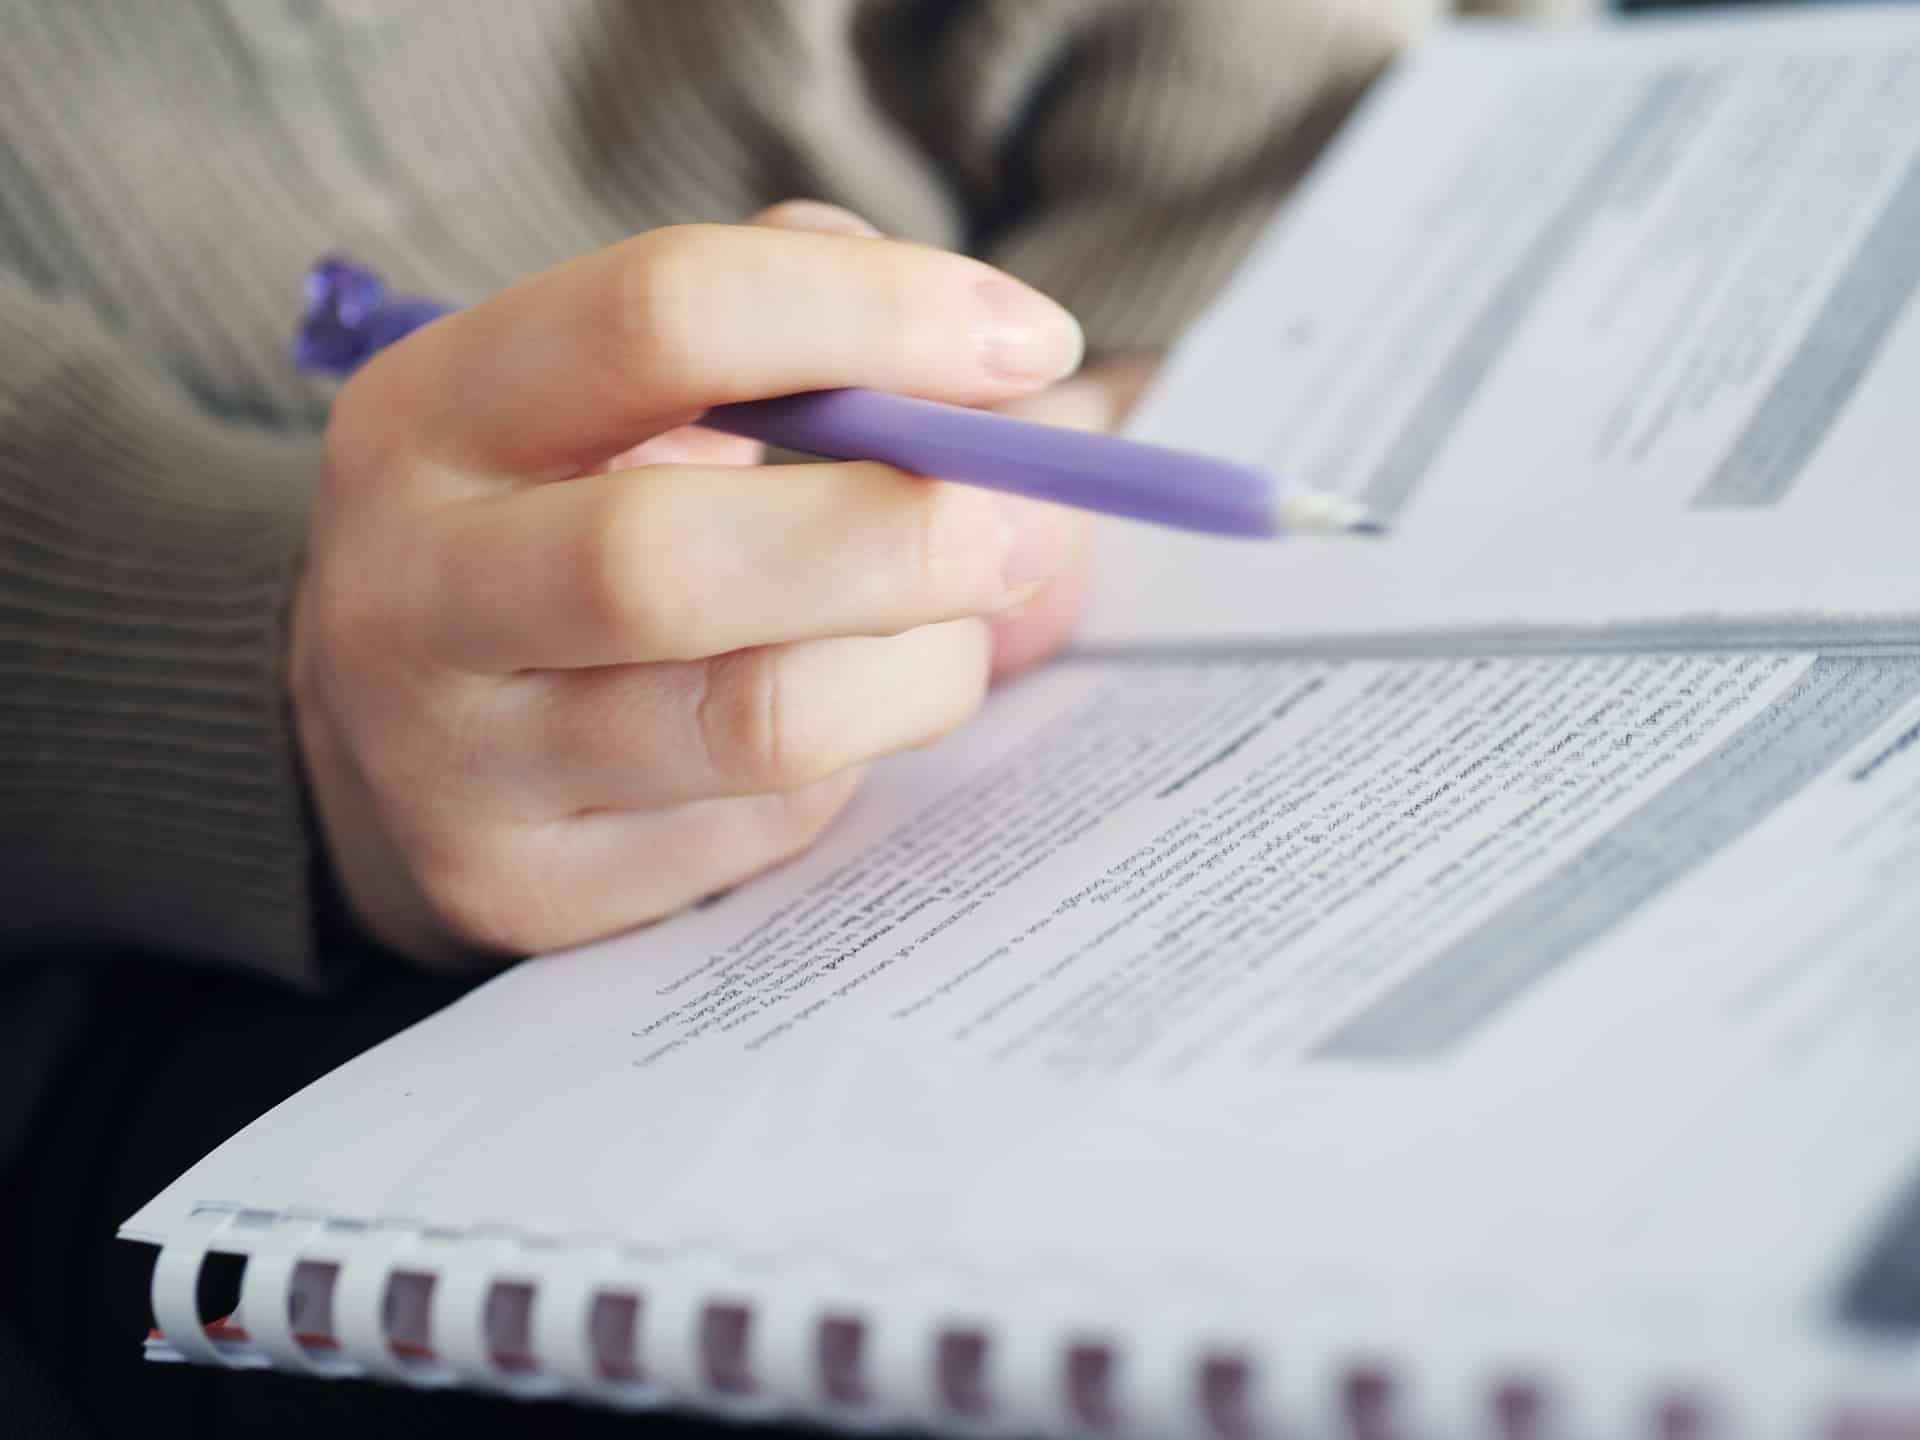 hand holding pen doing paperwork